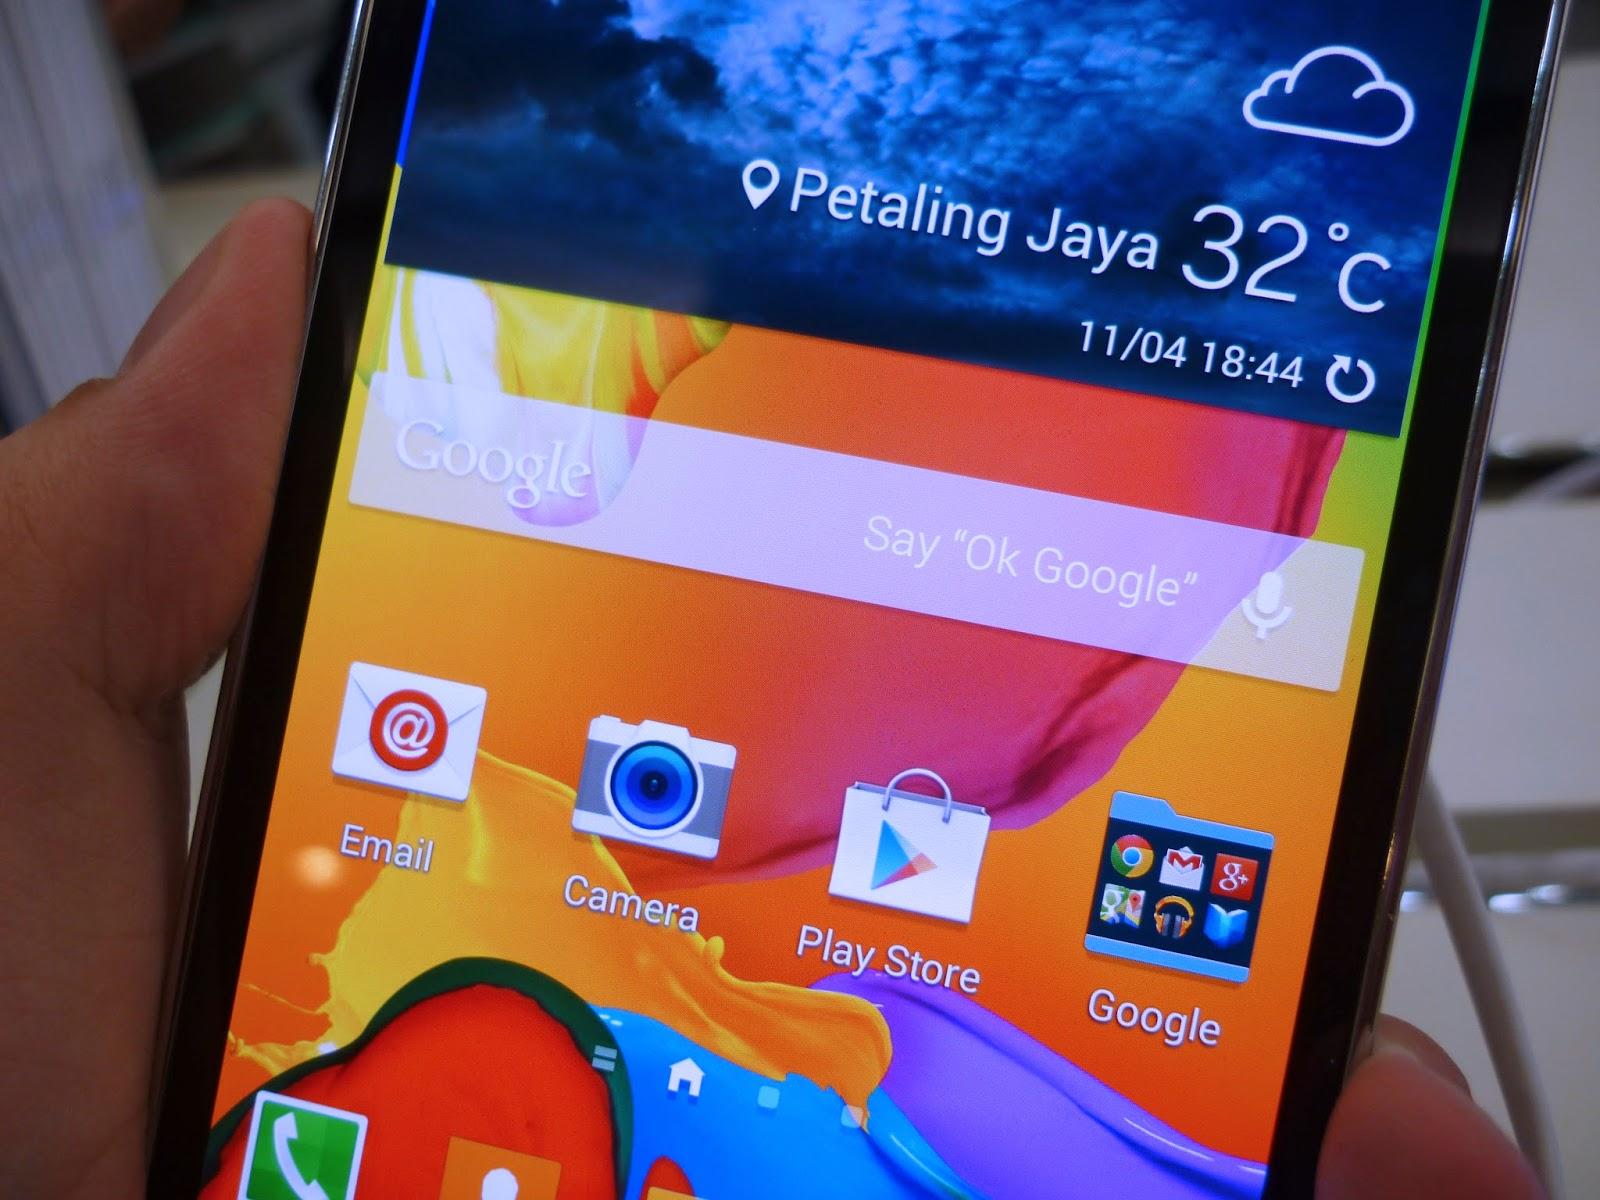 Samsung Galaxy S5 Maxis